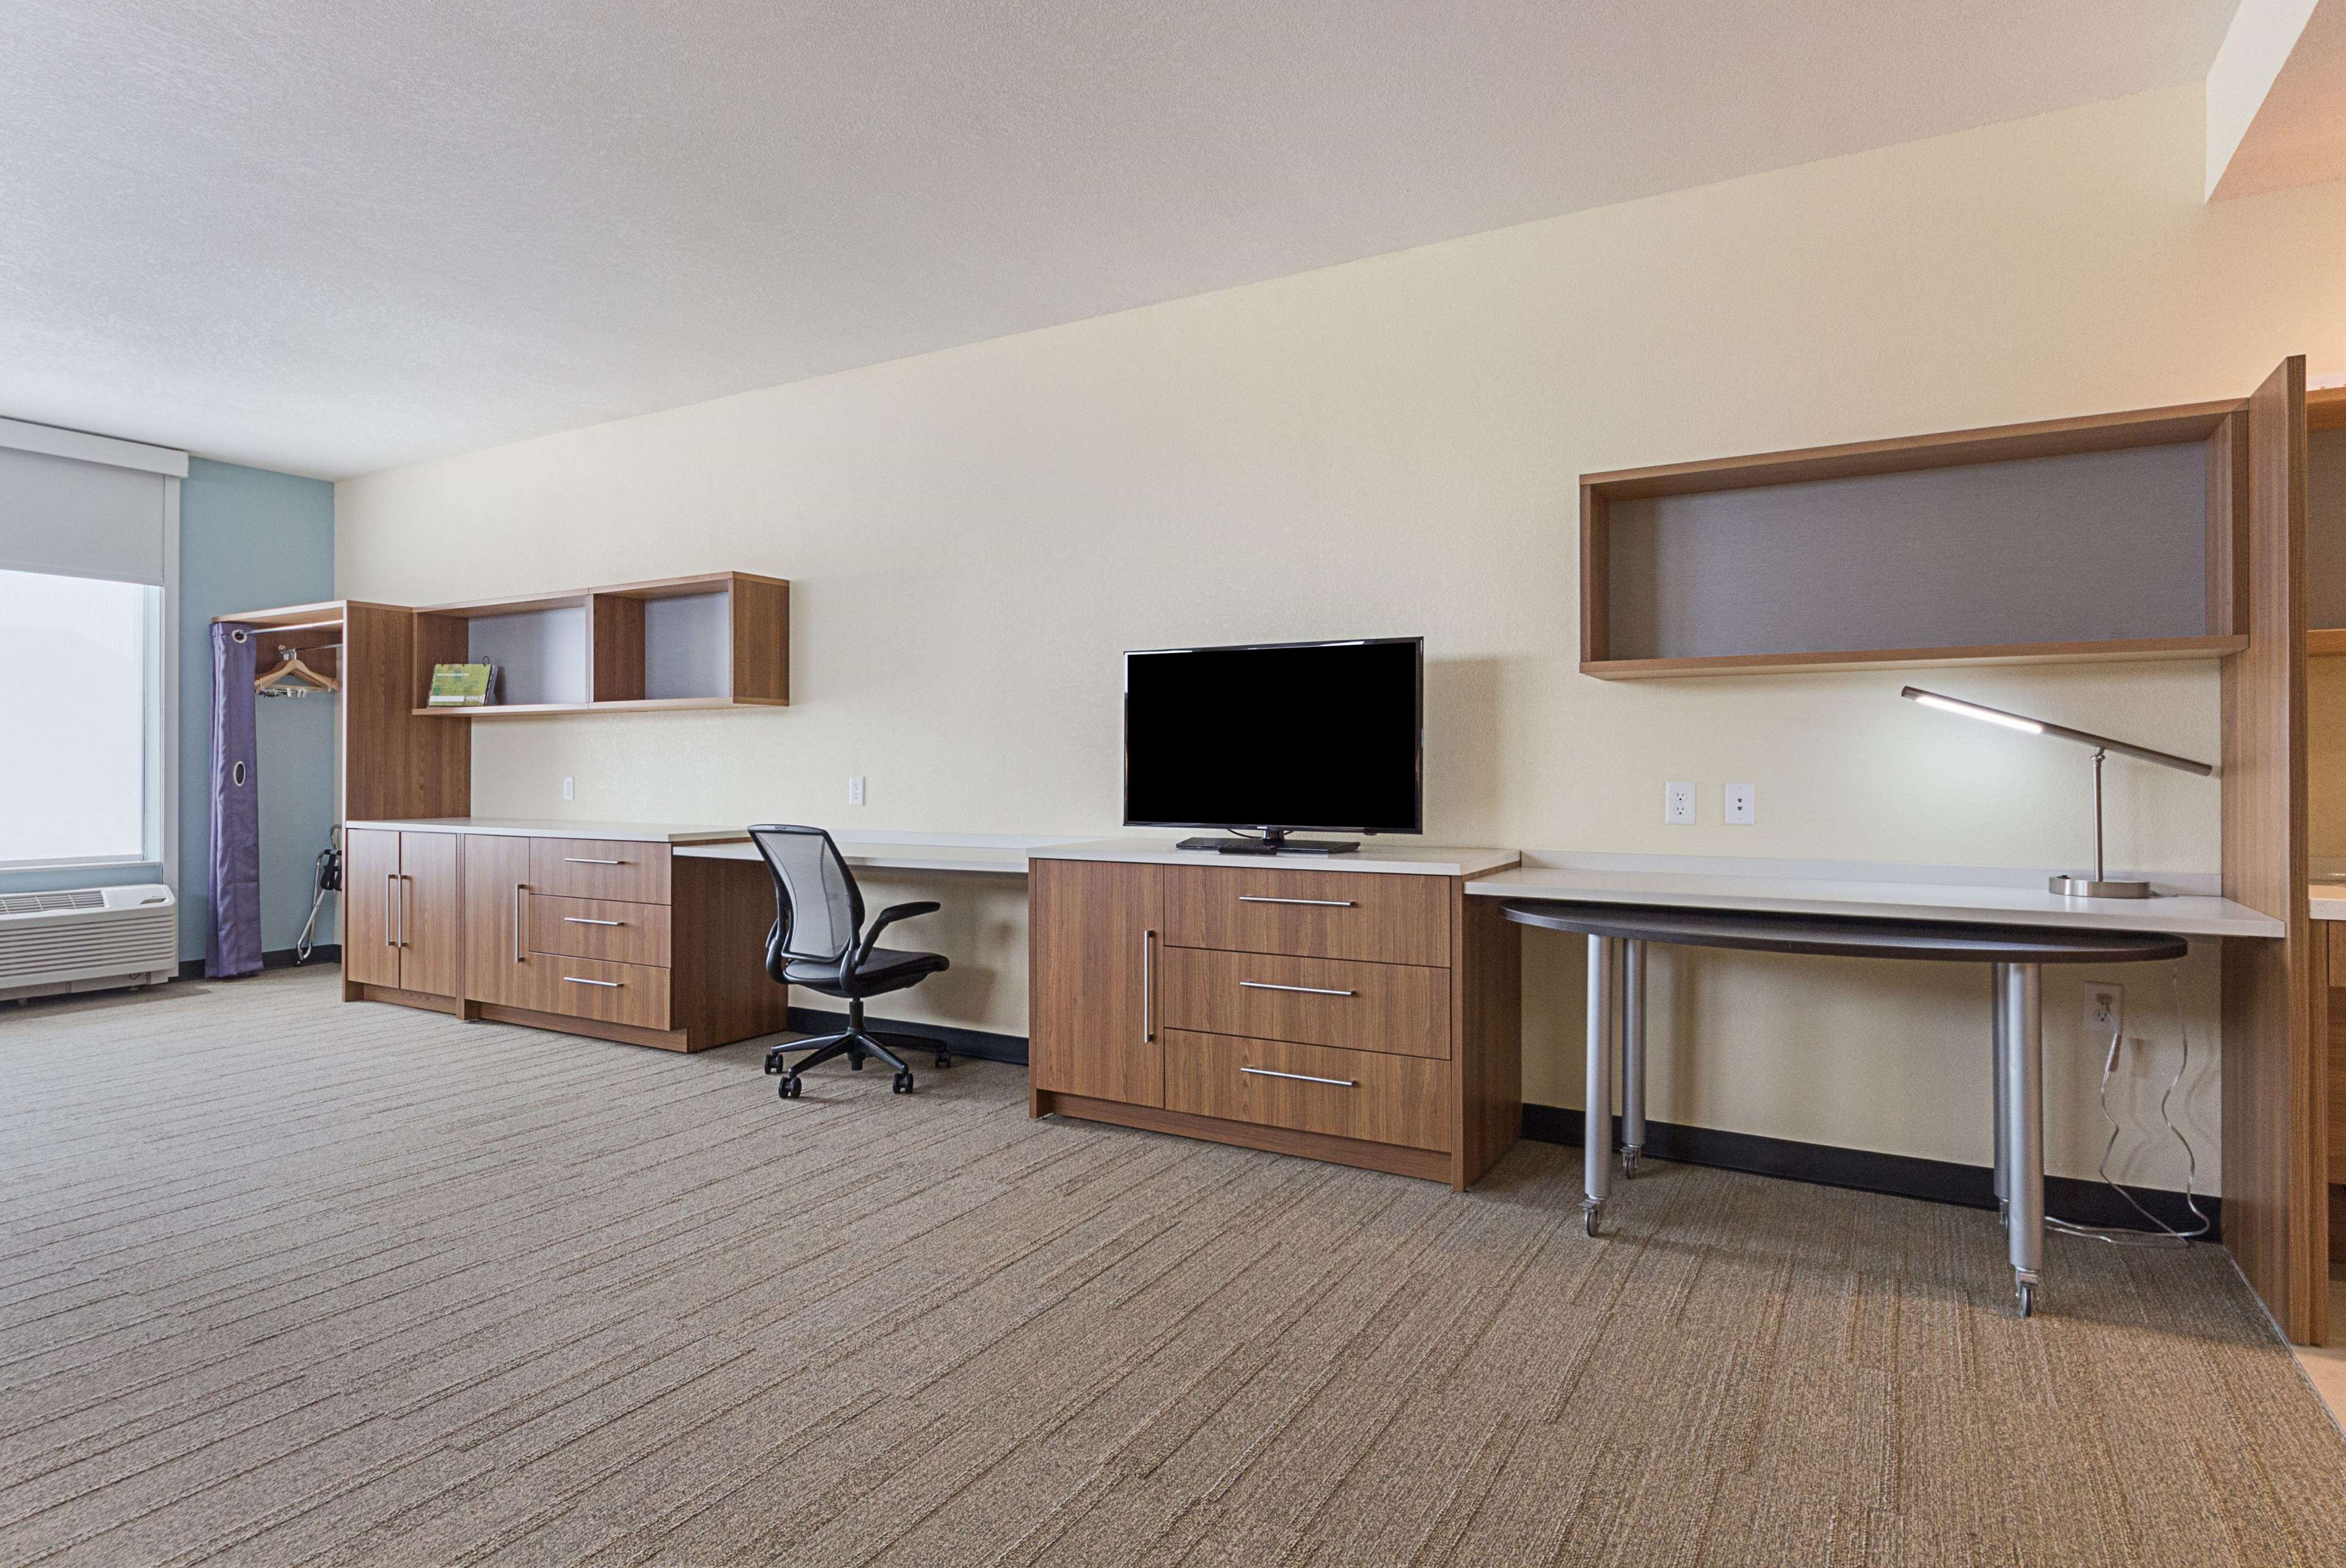 Home 2 Suites by Hilton - Yukon image 46